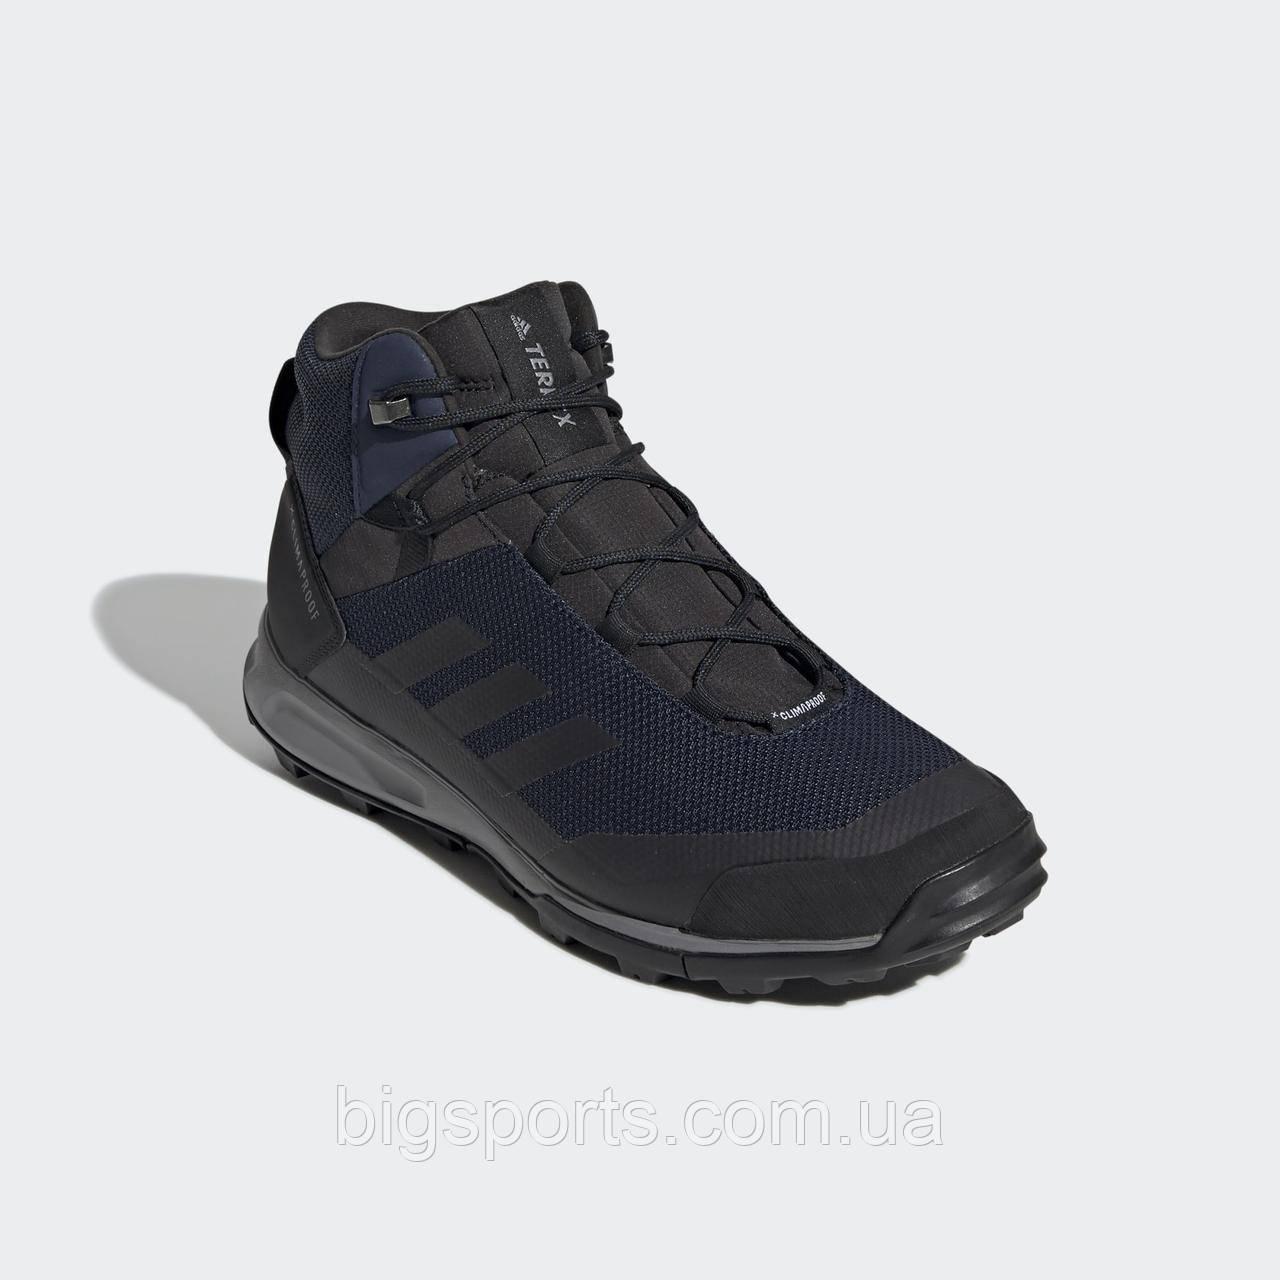 Кроссовки муж. Adidas Terrex Tivid Mid ClimaProof (арт. G26518)